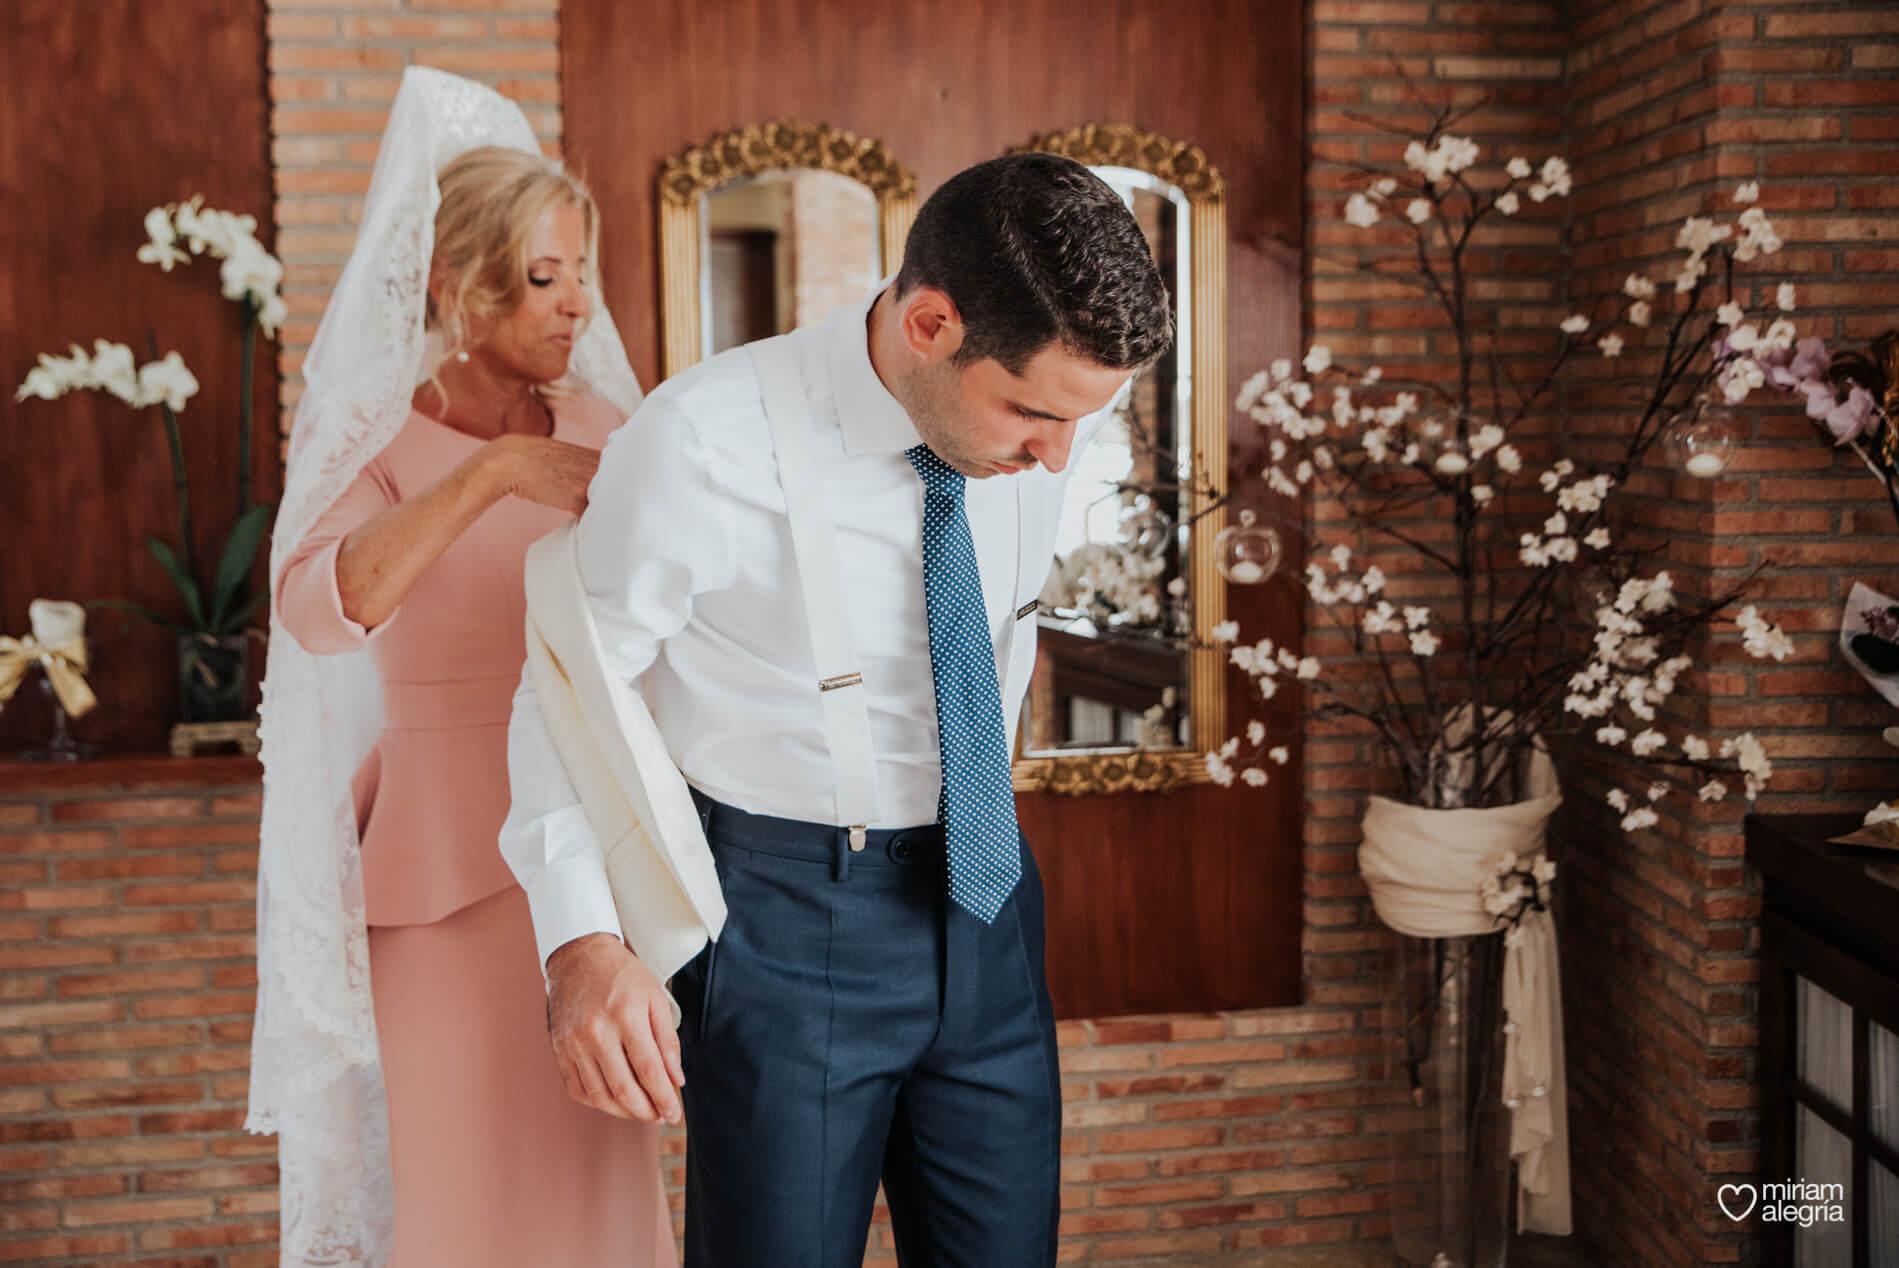 boda-en-almeria-miriam-alegria-21